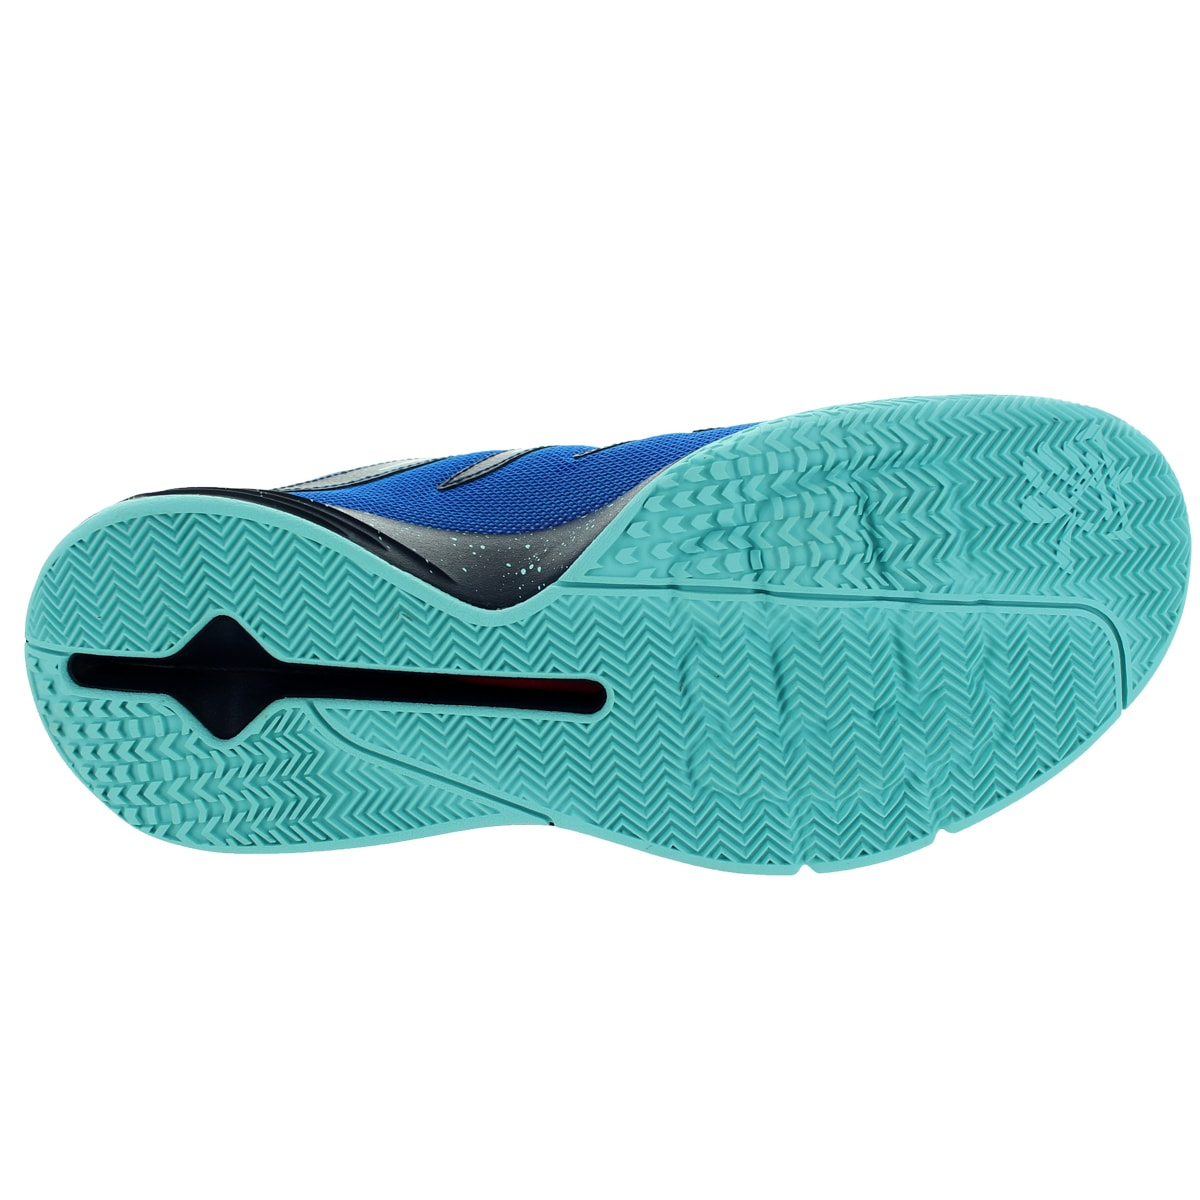 promo code da25f 5b4ac Shop Nike Jordan Men s Jordan Cp3.Ix Soar Infrared 23 Mid Navy Cp  Basketball Shoe - Free Shipping Today - Overstock - 12318259